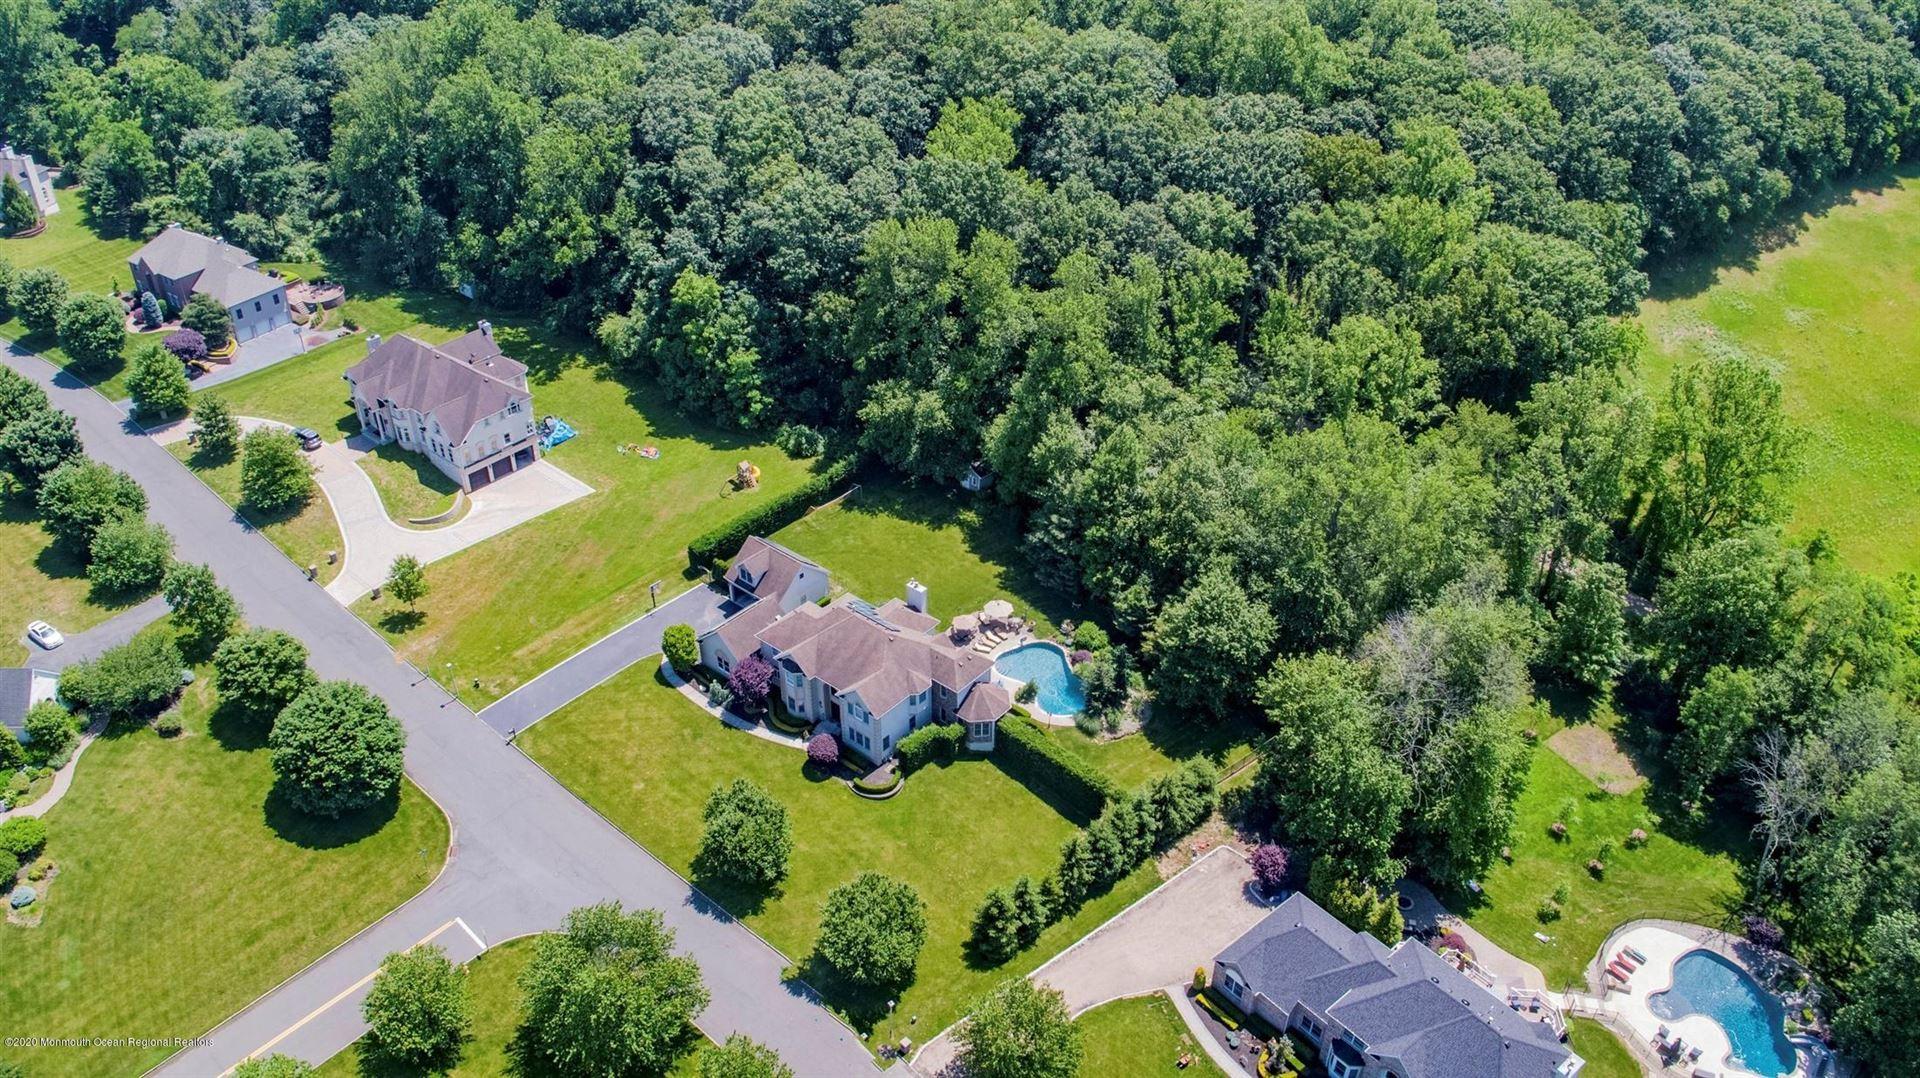 811 Turquoise Trail, Morganville, NJ 07751 - MLS#: 22021781